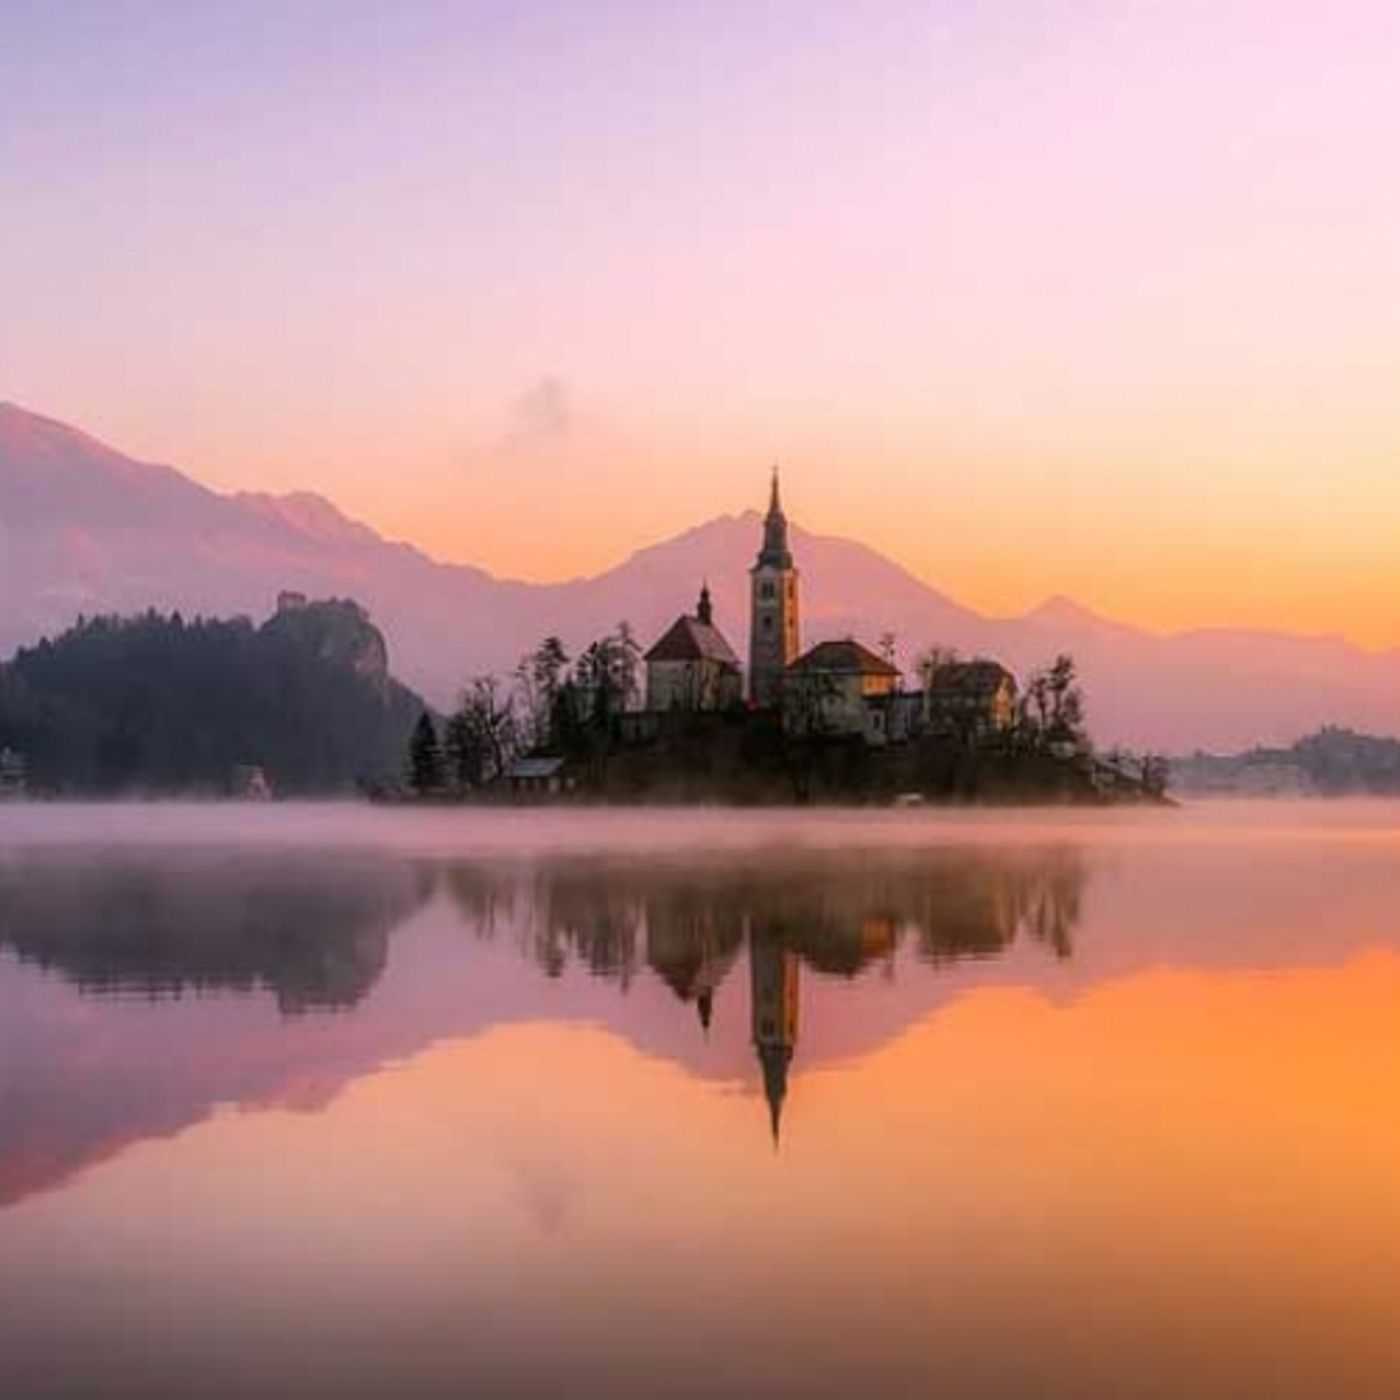 62 - Slovenia, le origini cristiane